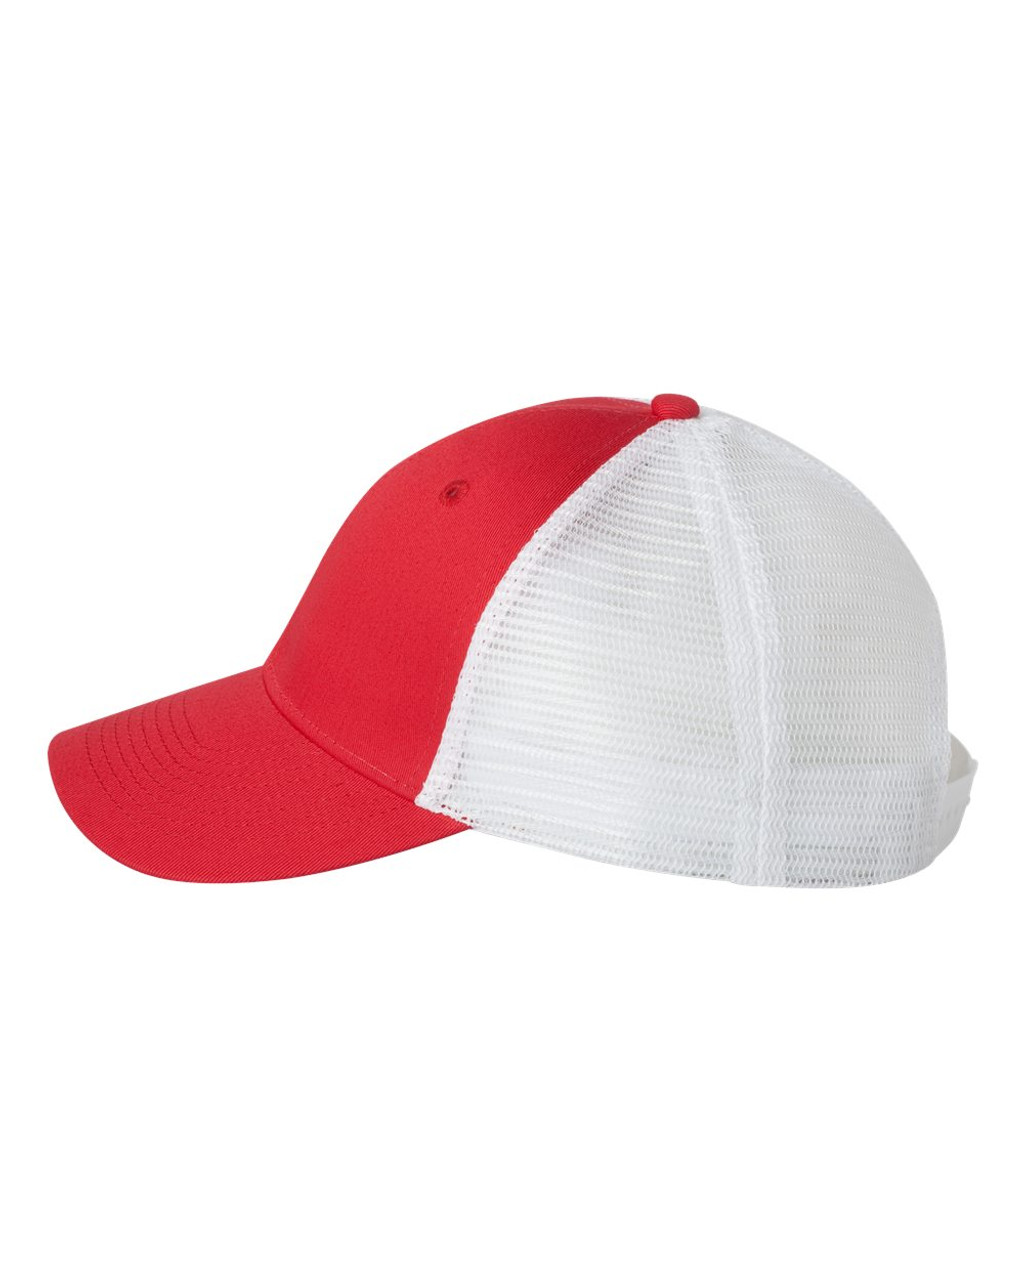 VC400 Mesh-Back Trucker Cap | T-shirt.ca